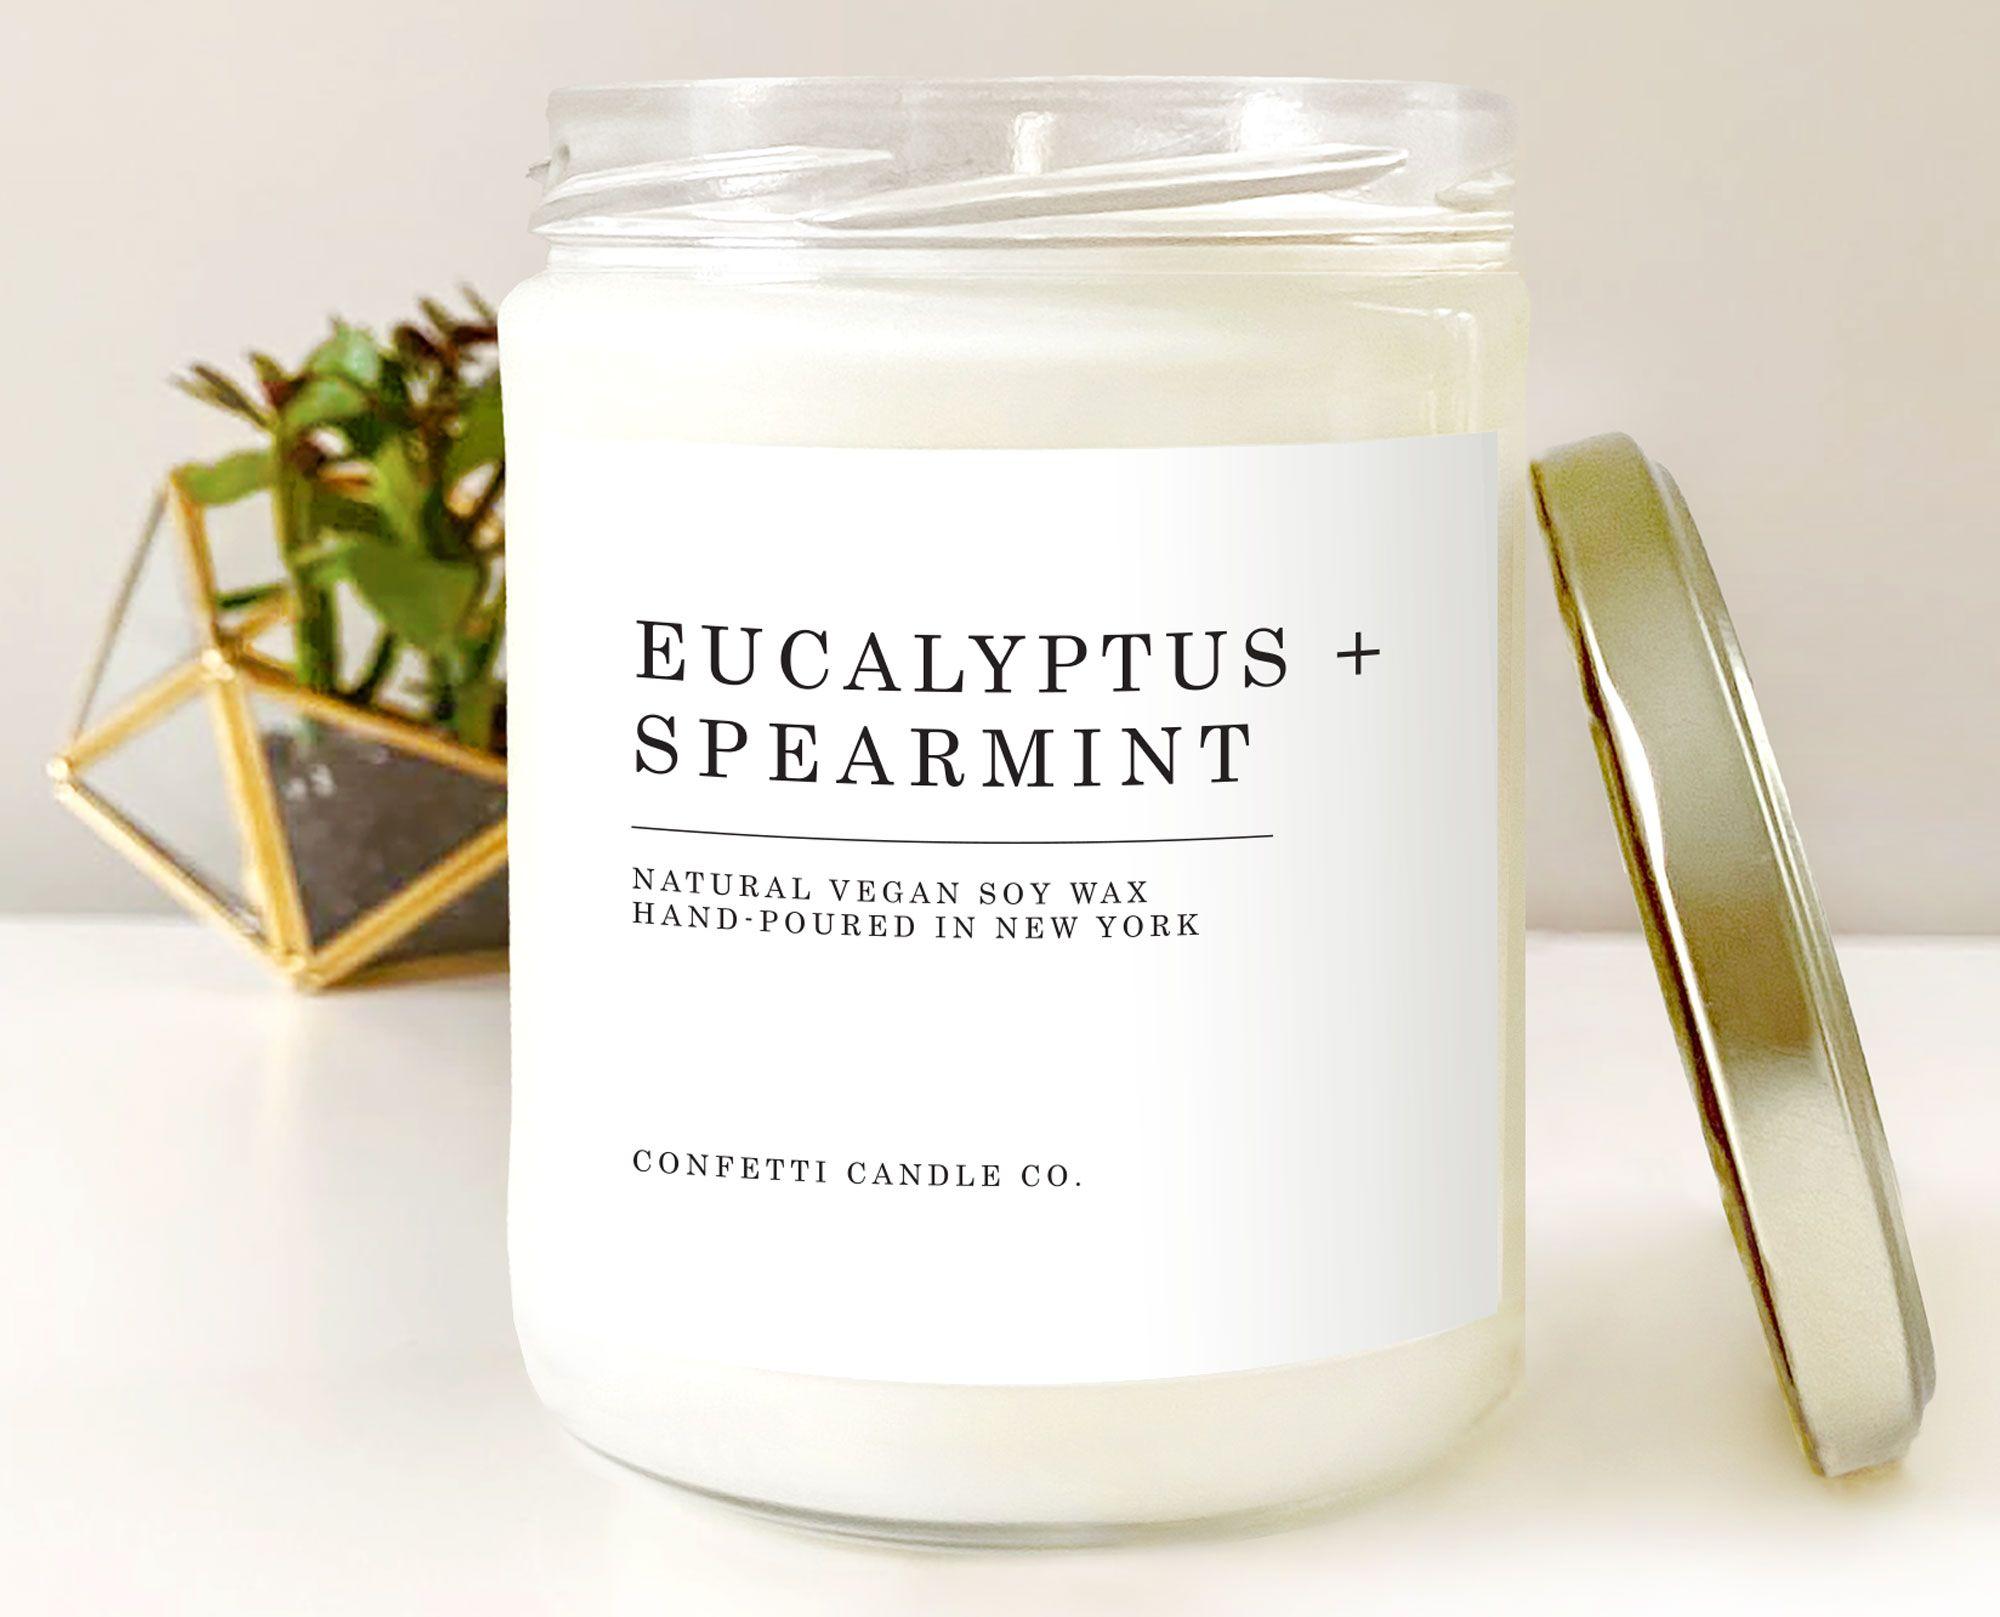 Eucalyptus Spearmint Vegan Candle Soy Natural Soy Wax Candle Etsy Natural Soy Wax Candles Soy Wax Candles Soy Candles